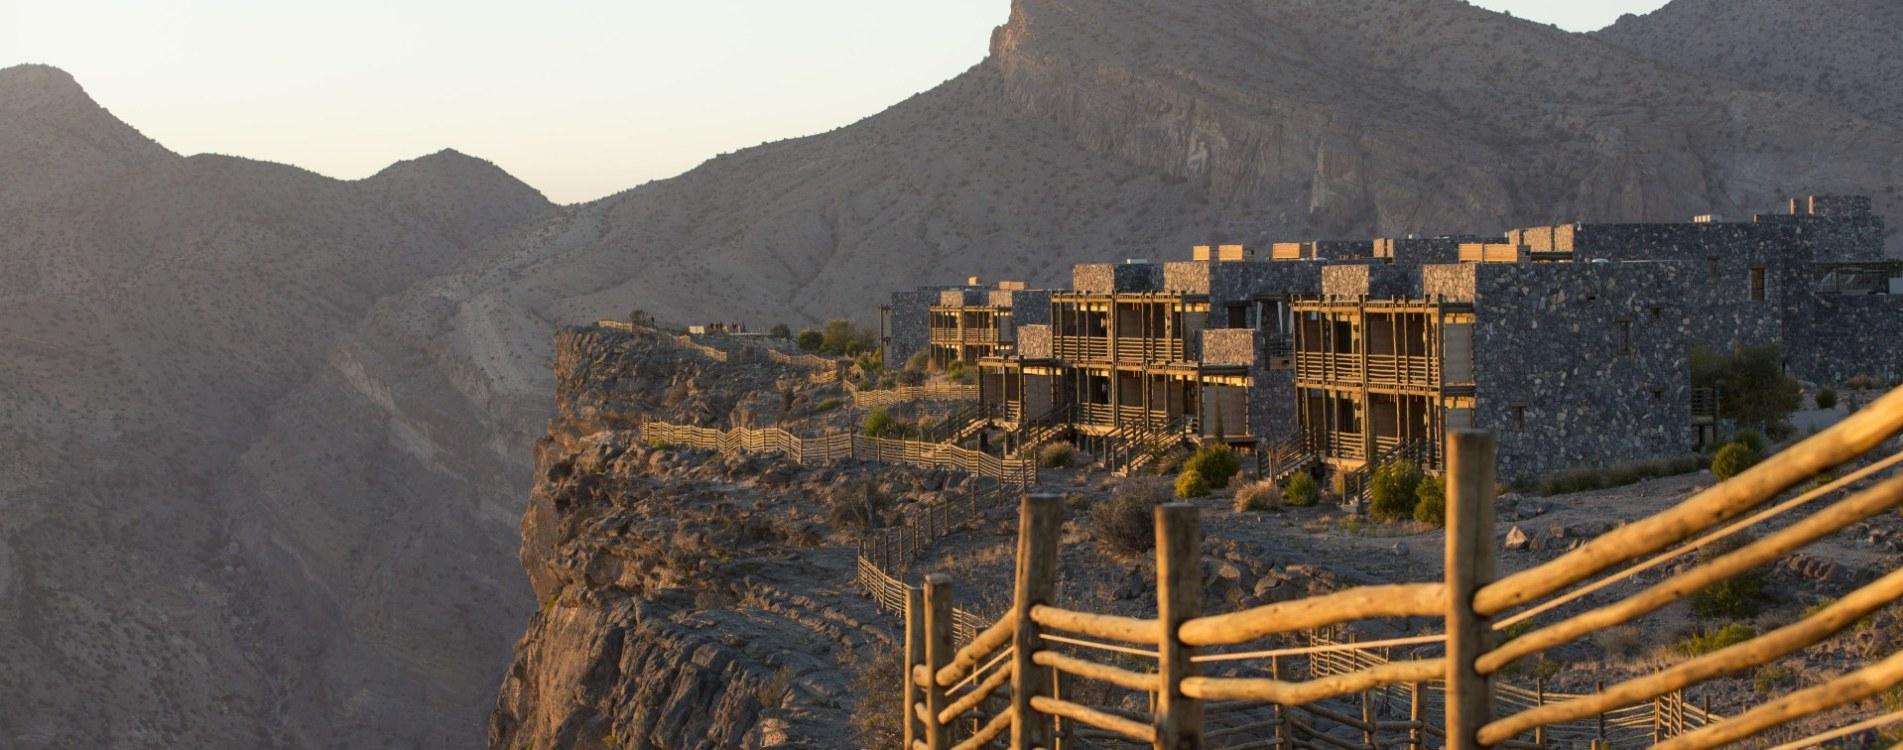 Alila-Jabal-Akhdar-Klippen-Berge-Hotel-Exterior-Oman.JPG